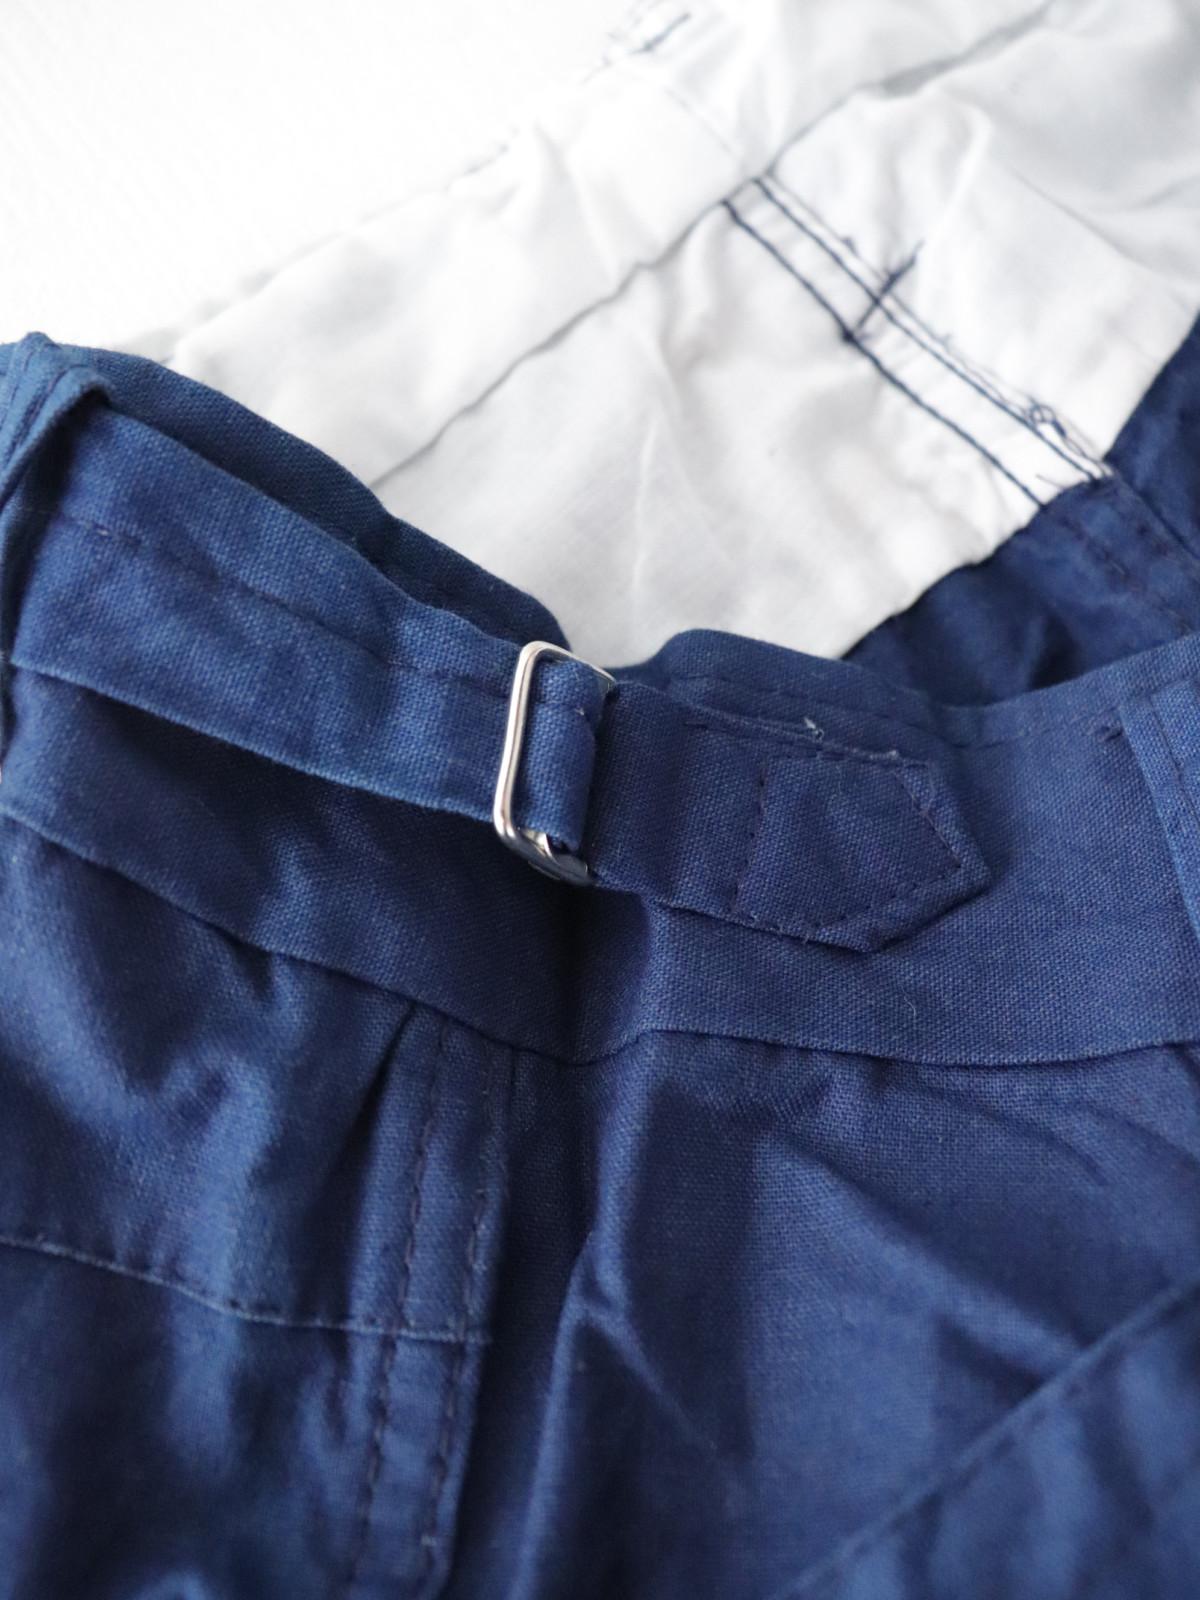 indigo cotton, work pants, France, Dead Stock